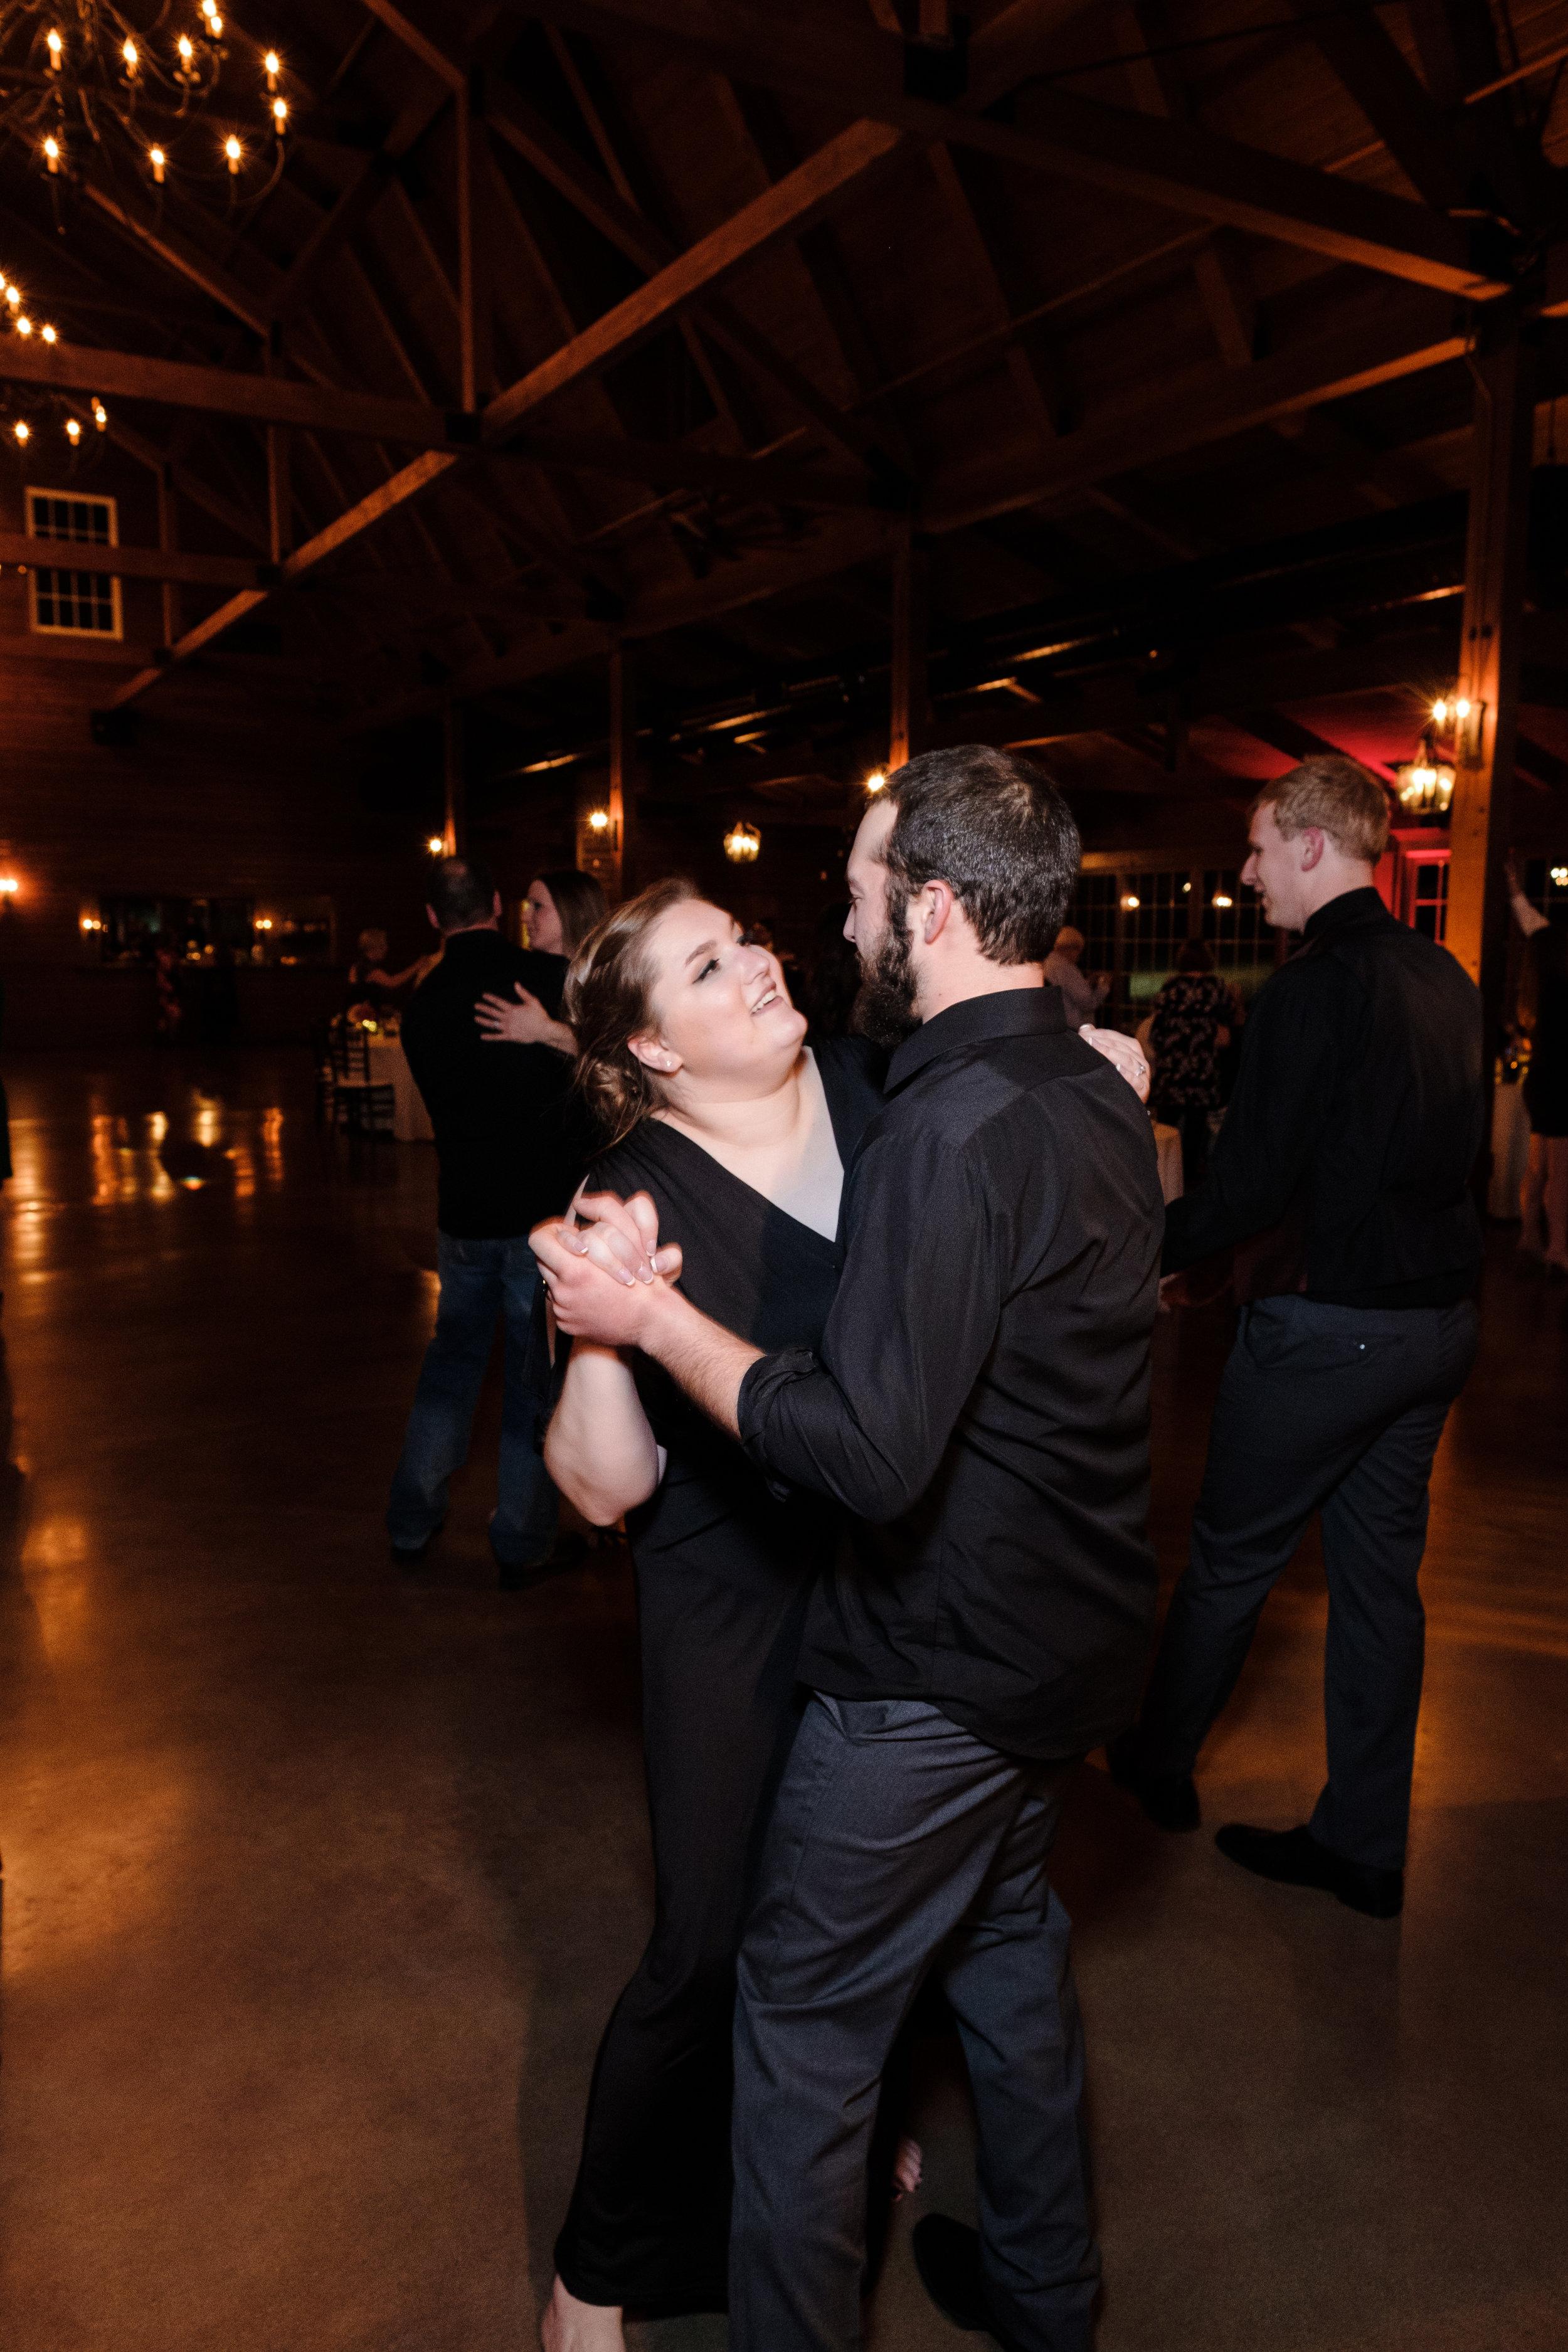 18-12-28 Corinne-Henry-Pavilion-Wedding-690.jpg